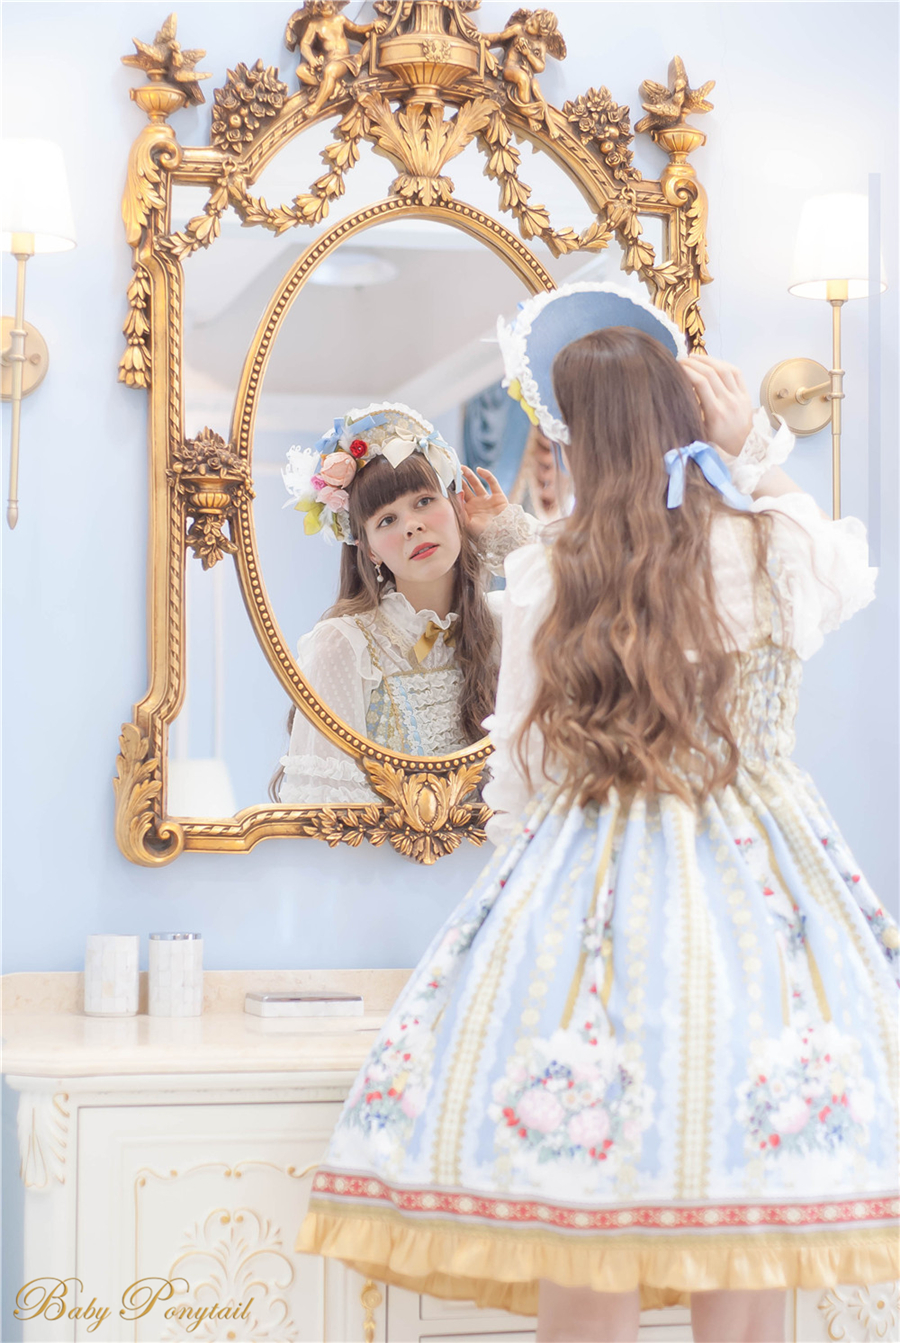 Baby Ponytail_Model Photo_Polly's Garden of Dreams_JSK Blue_Claudia_10.jpg